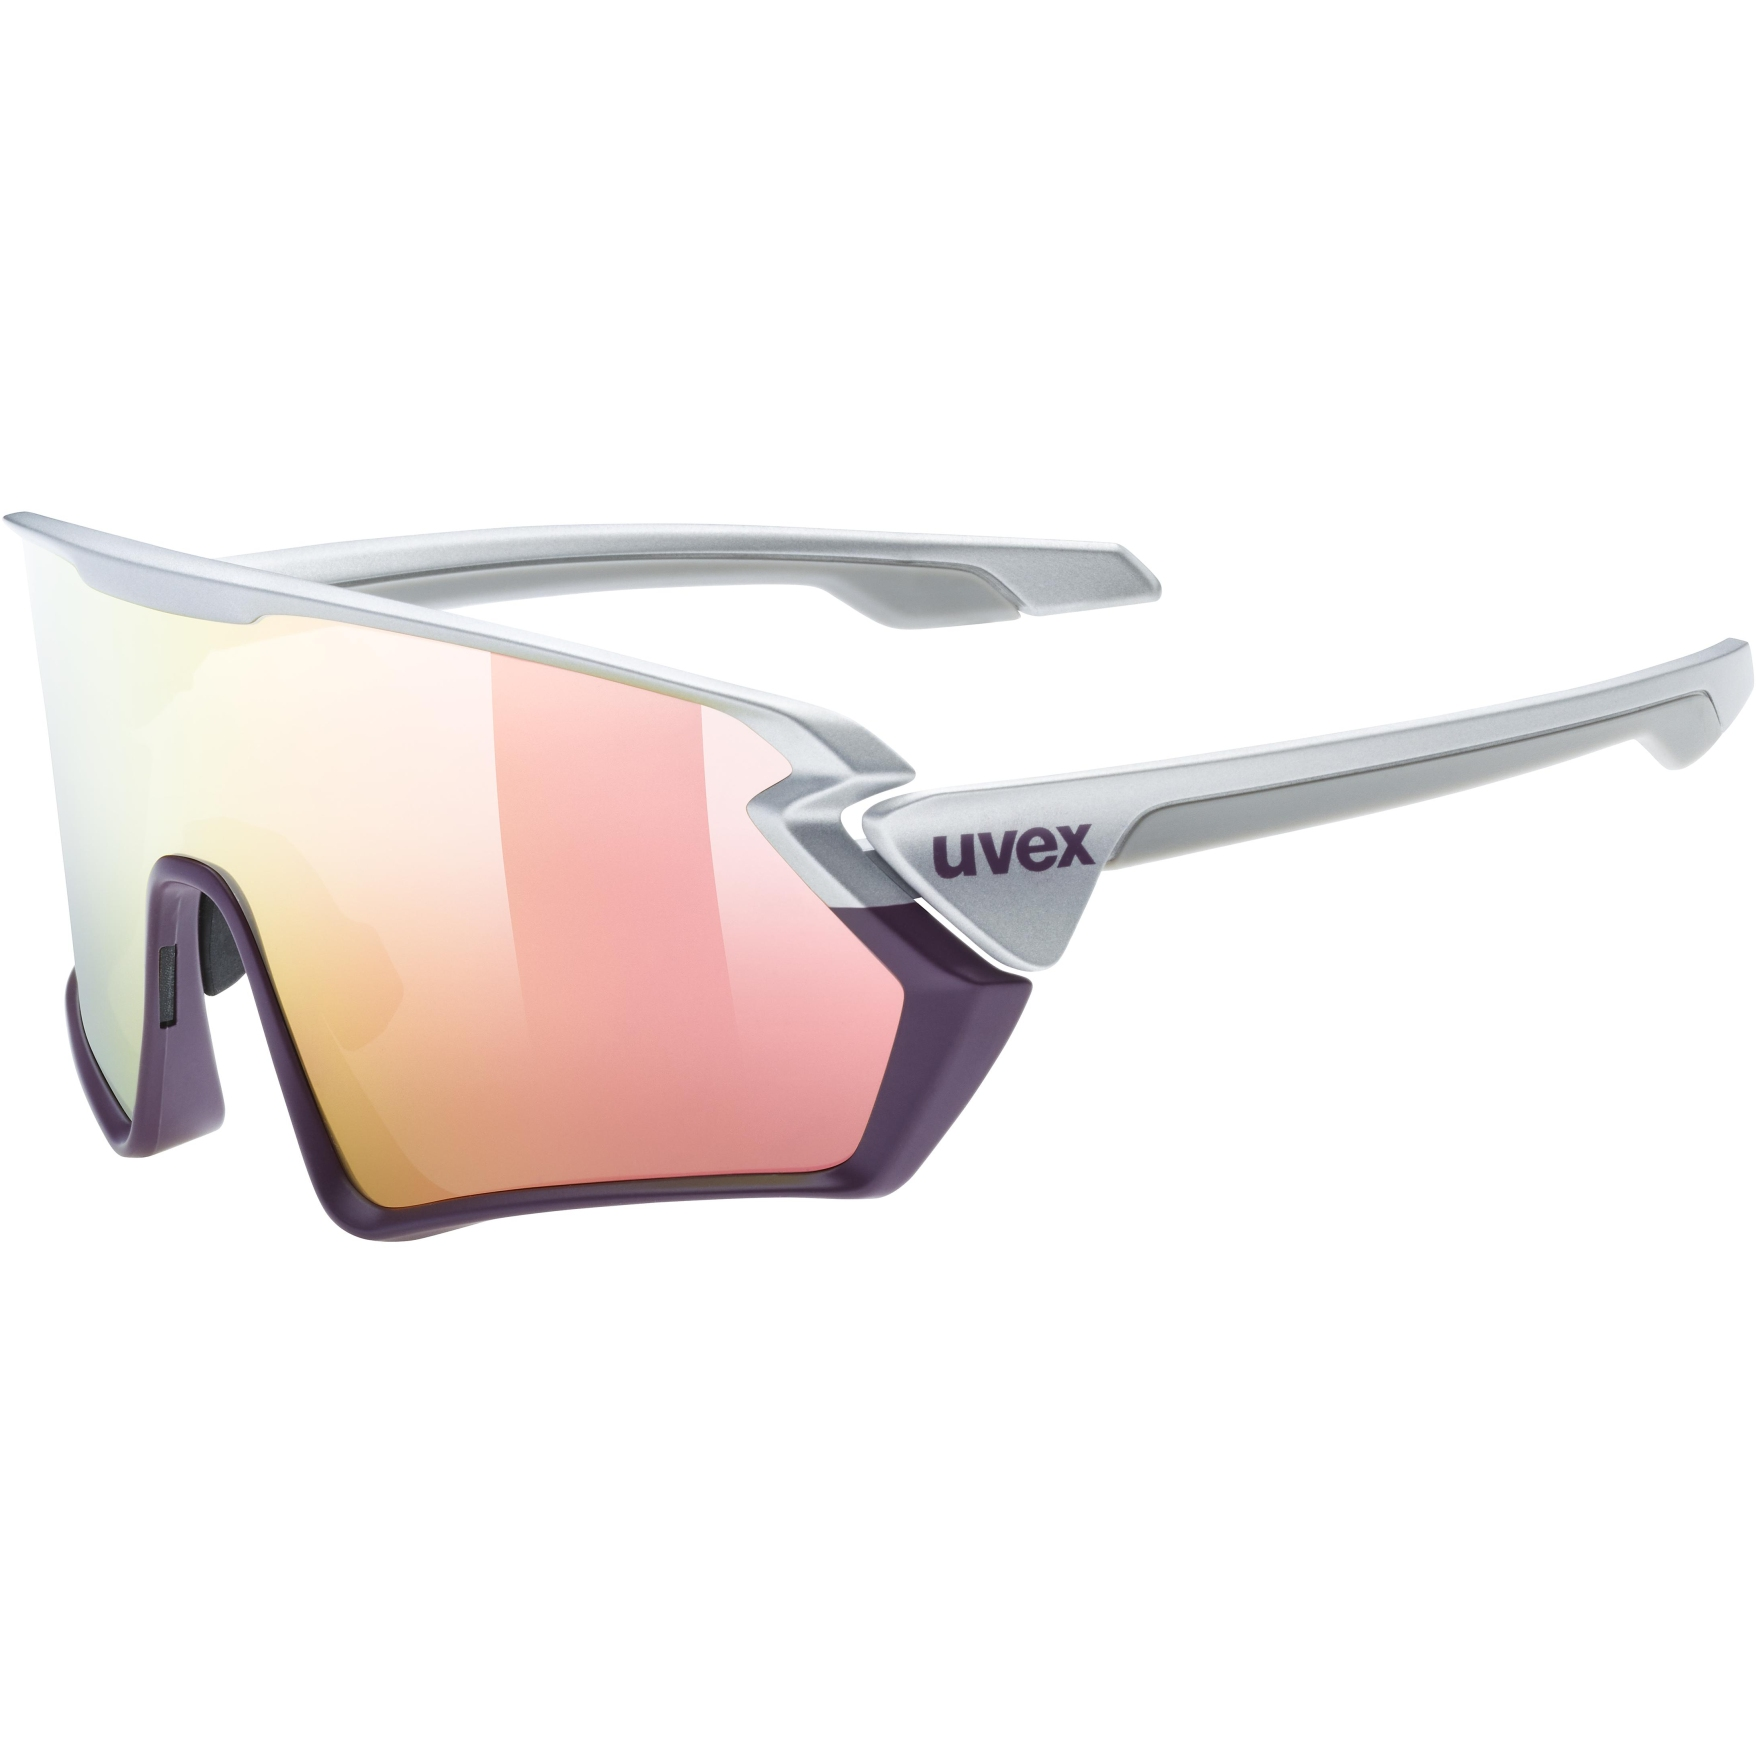 Uvex sportstyle 231 Glasses - silver plum mat/mirror rose